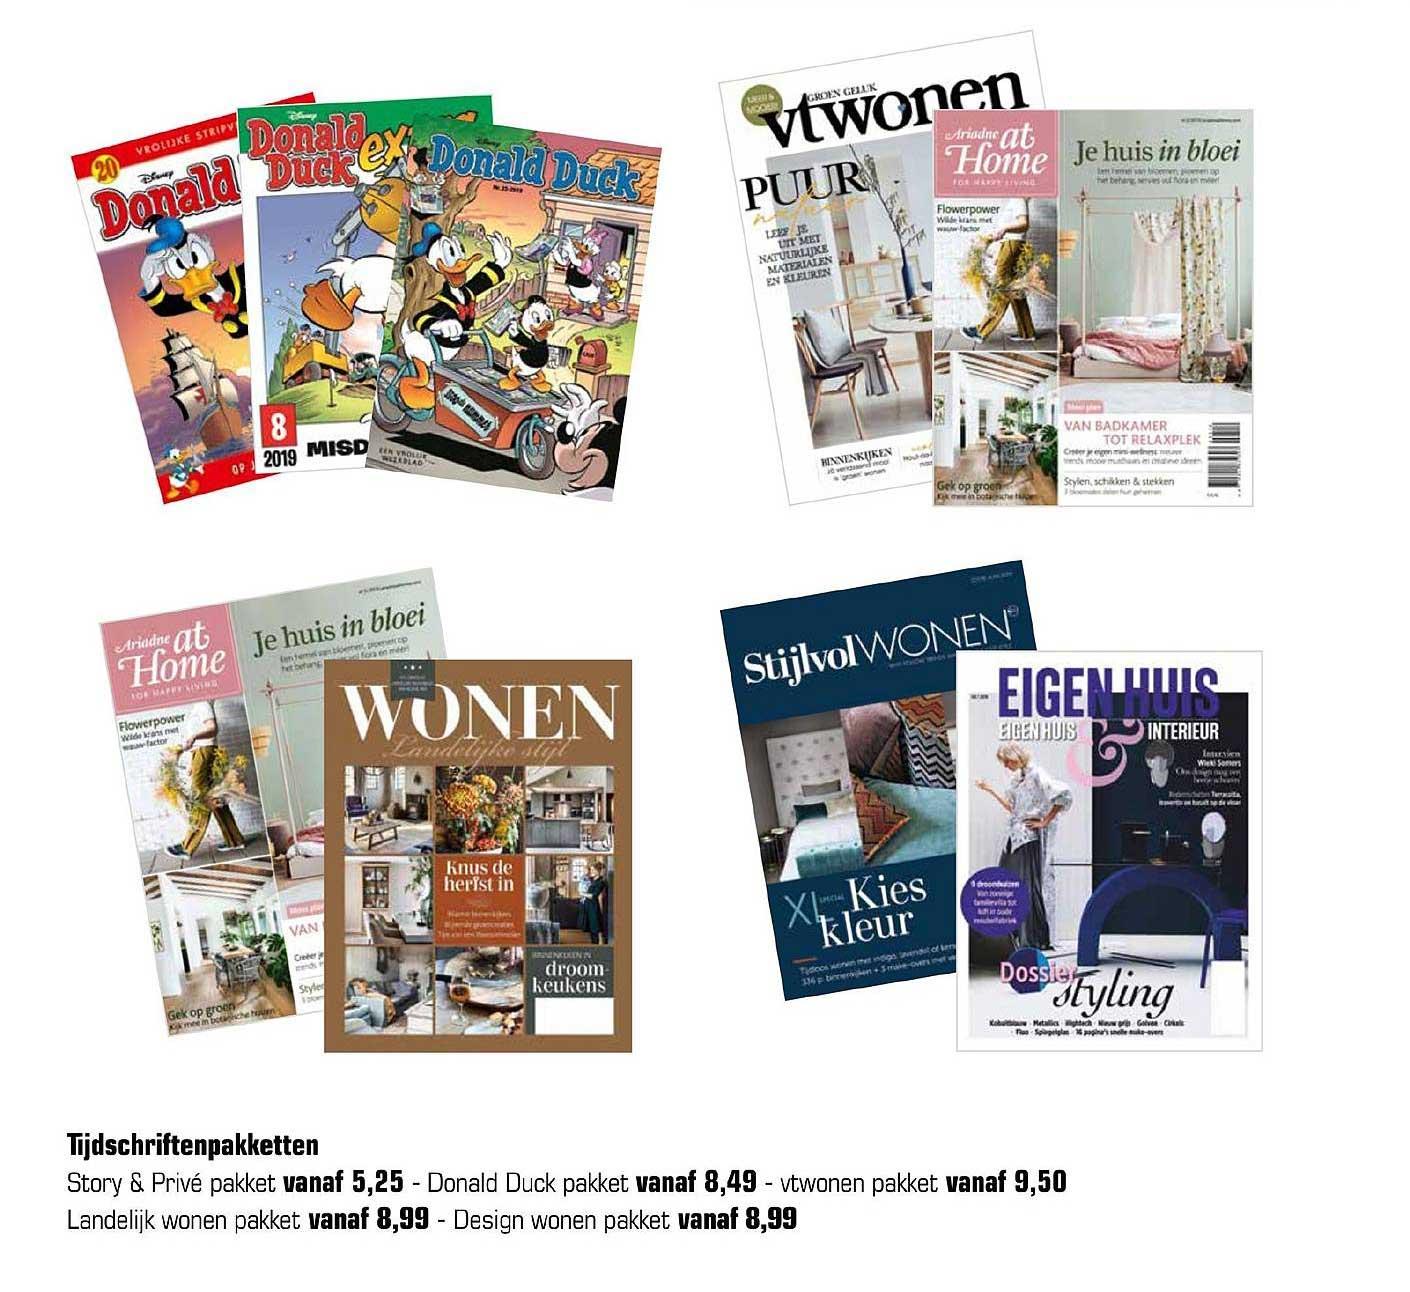 Primera Tijdschriftenpakketten